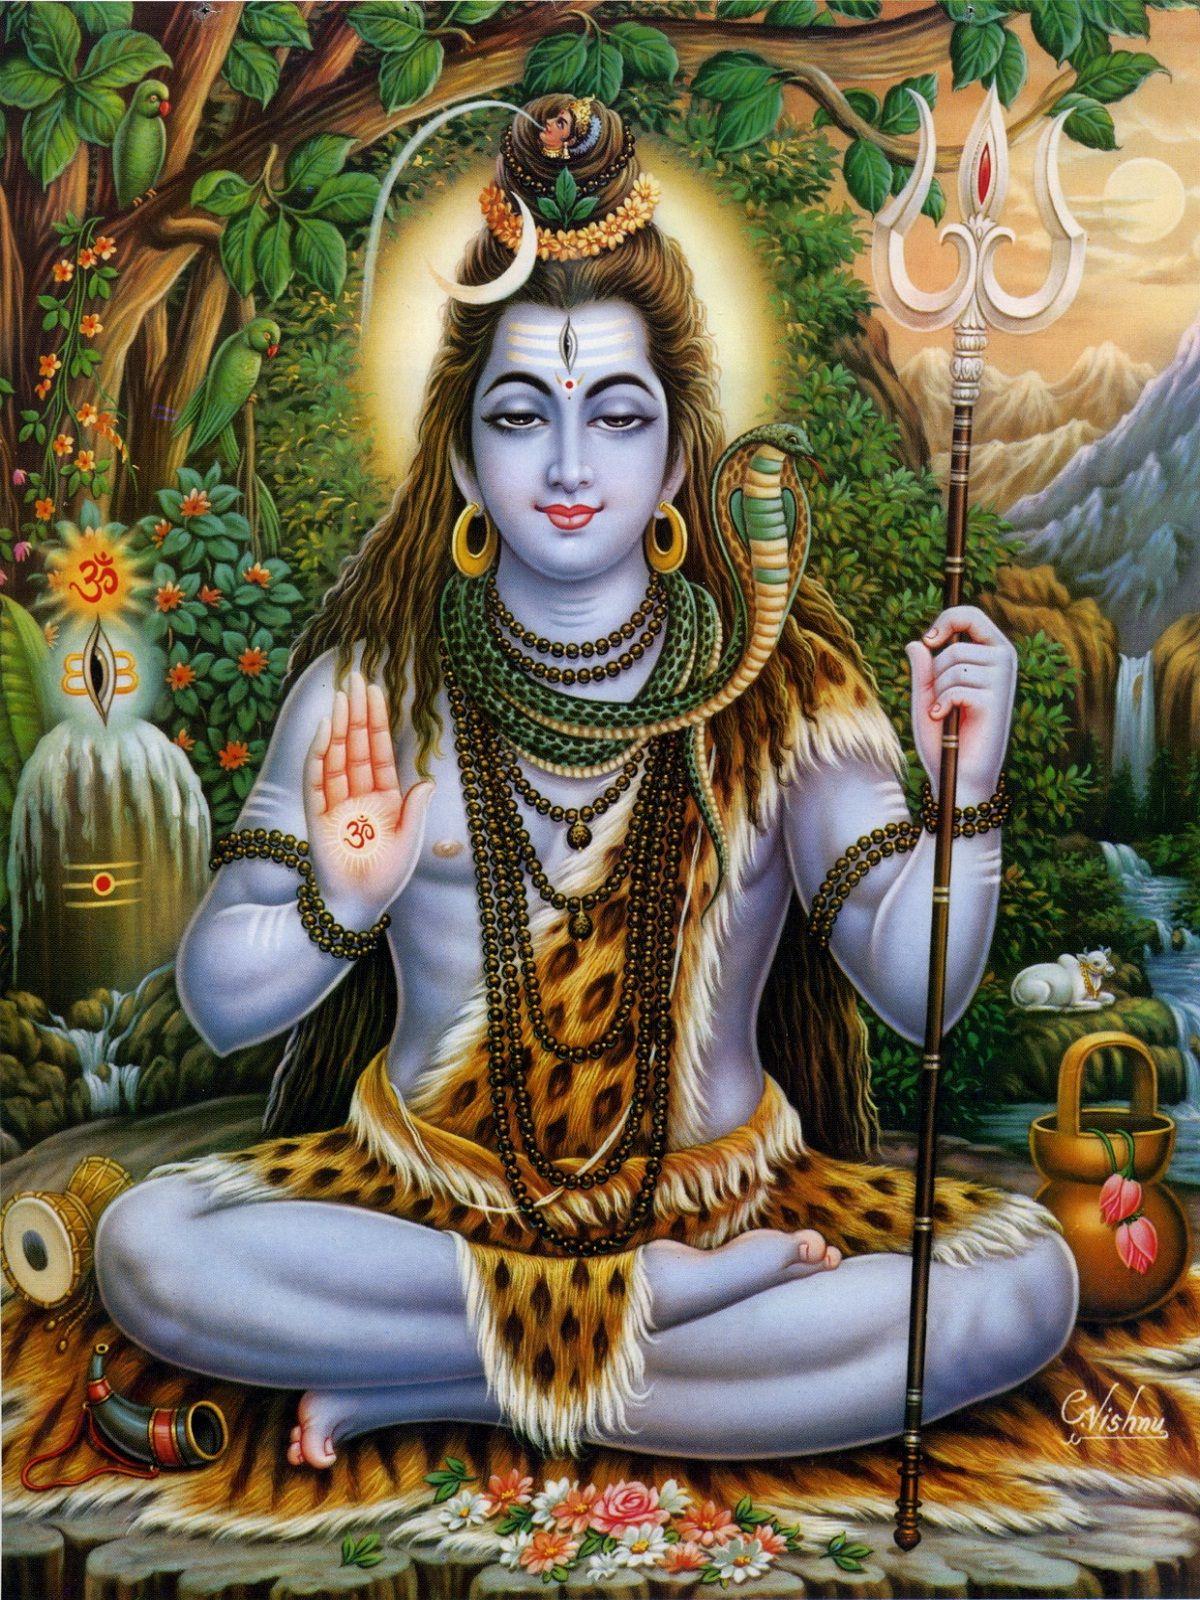 Lord Shiva chanted the nama traya astra mantra